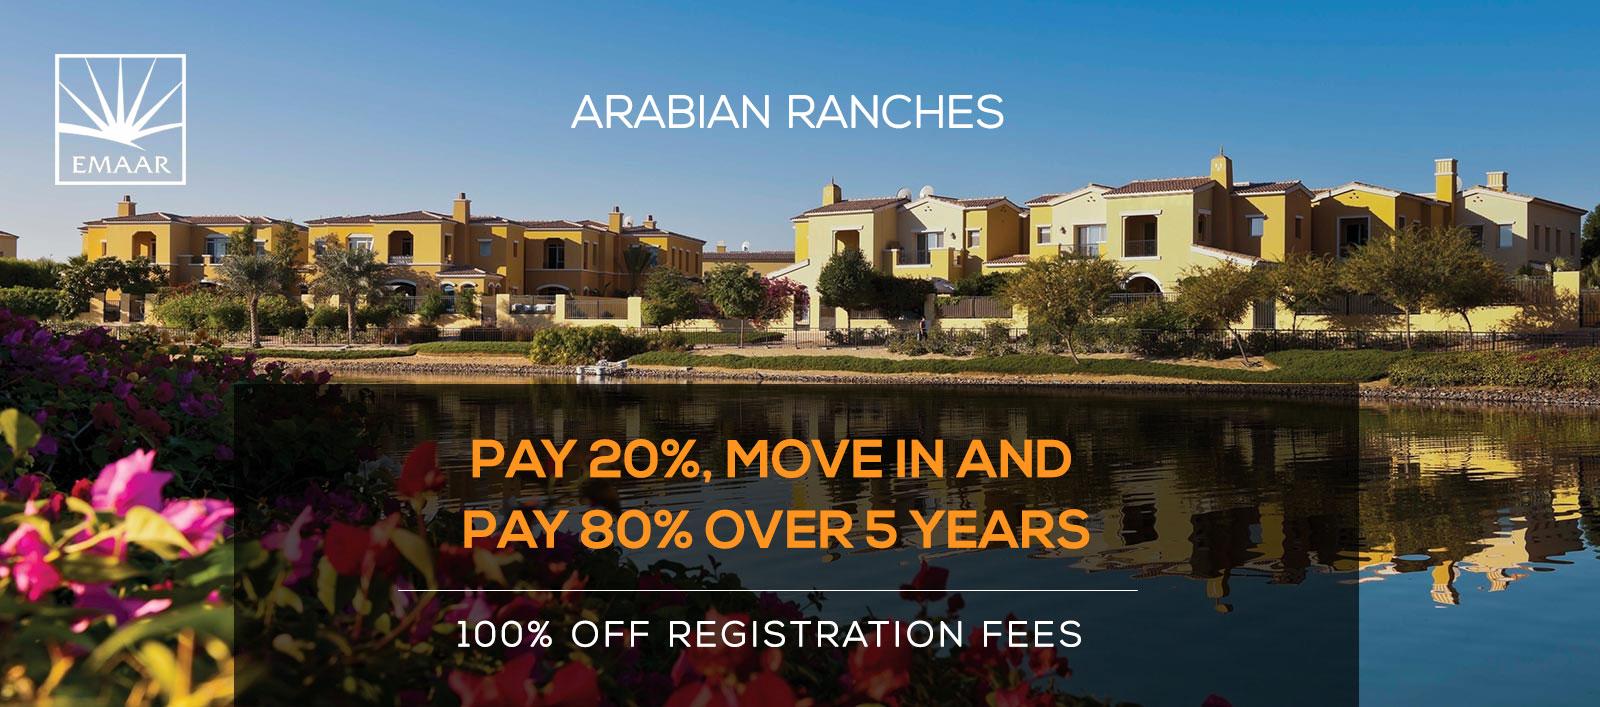 arabian-ranches-offer-final